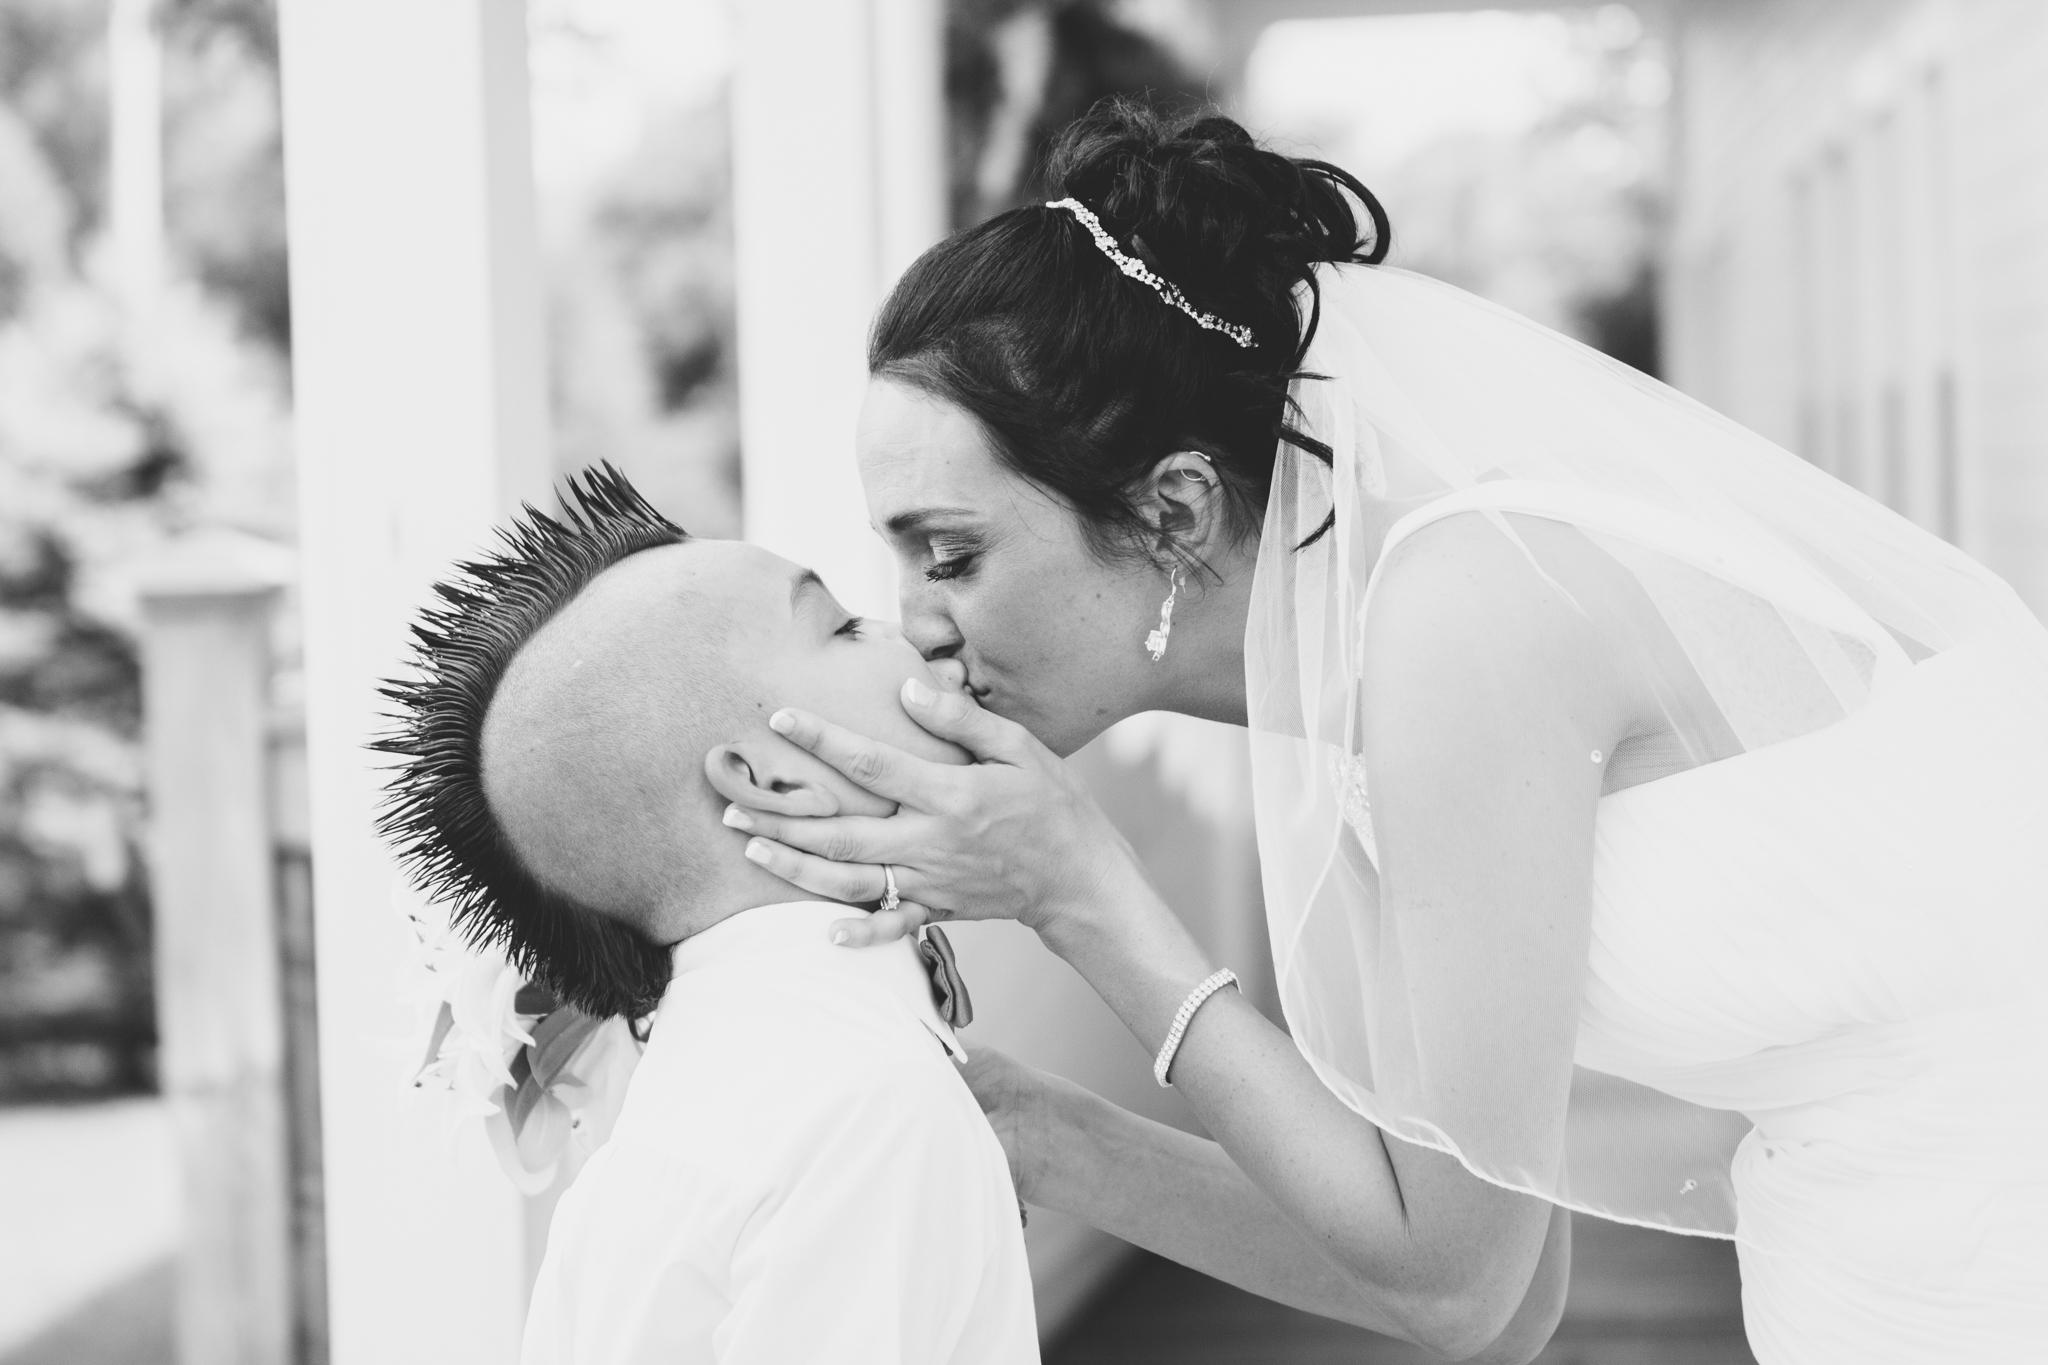 Richmond Kentucky Wedding Photographer - Ariana Jordan Photography -5-2.jpg